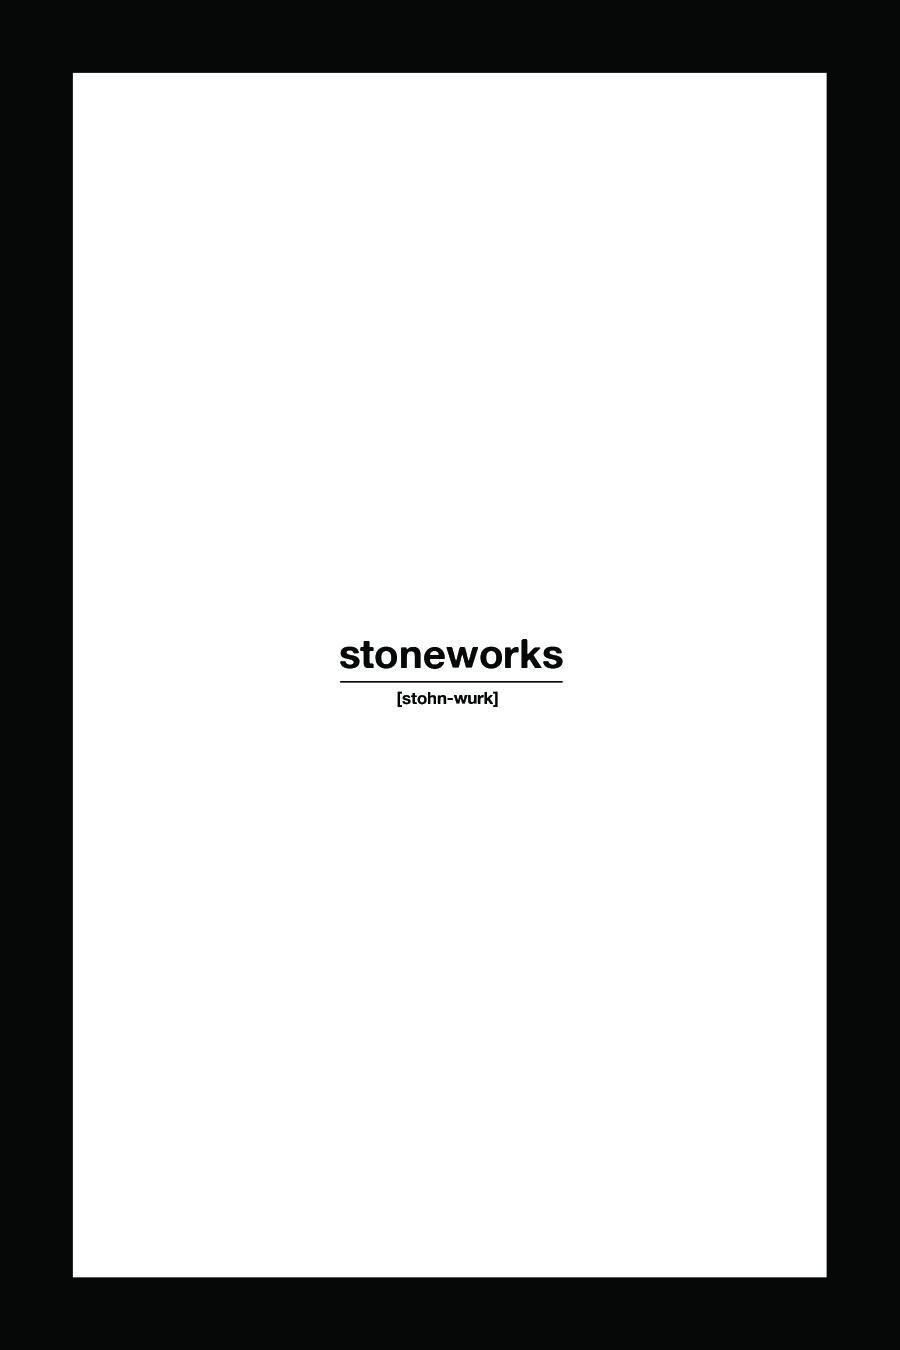 FLUX GOLF - SALES SHEET - stoneworks-01.jpg